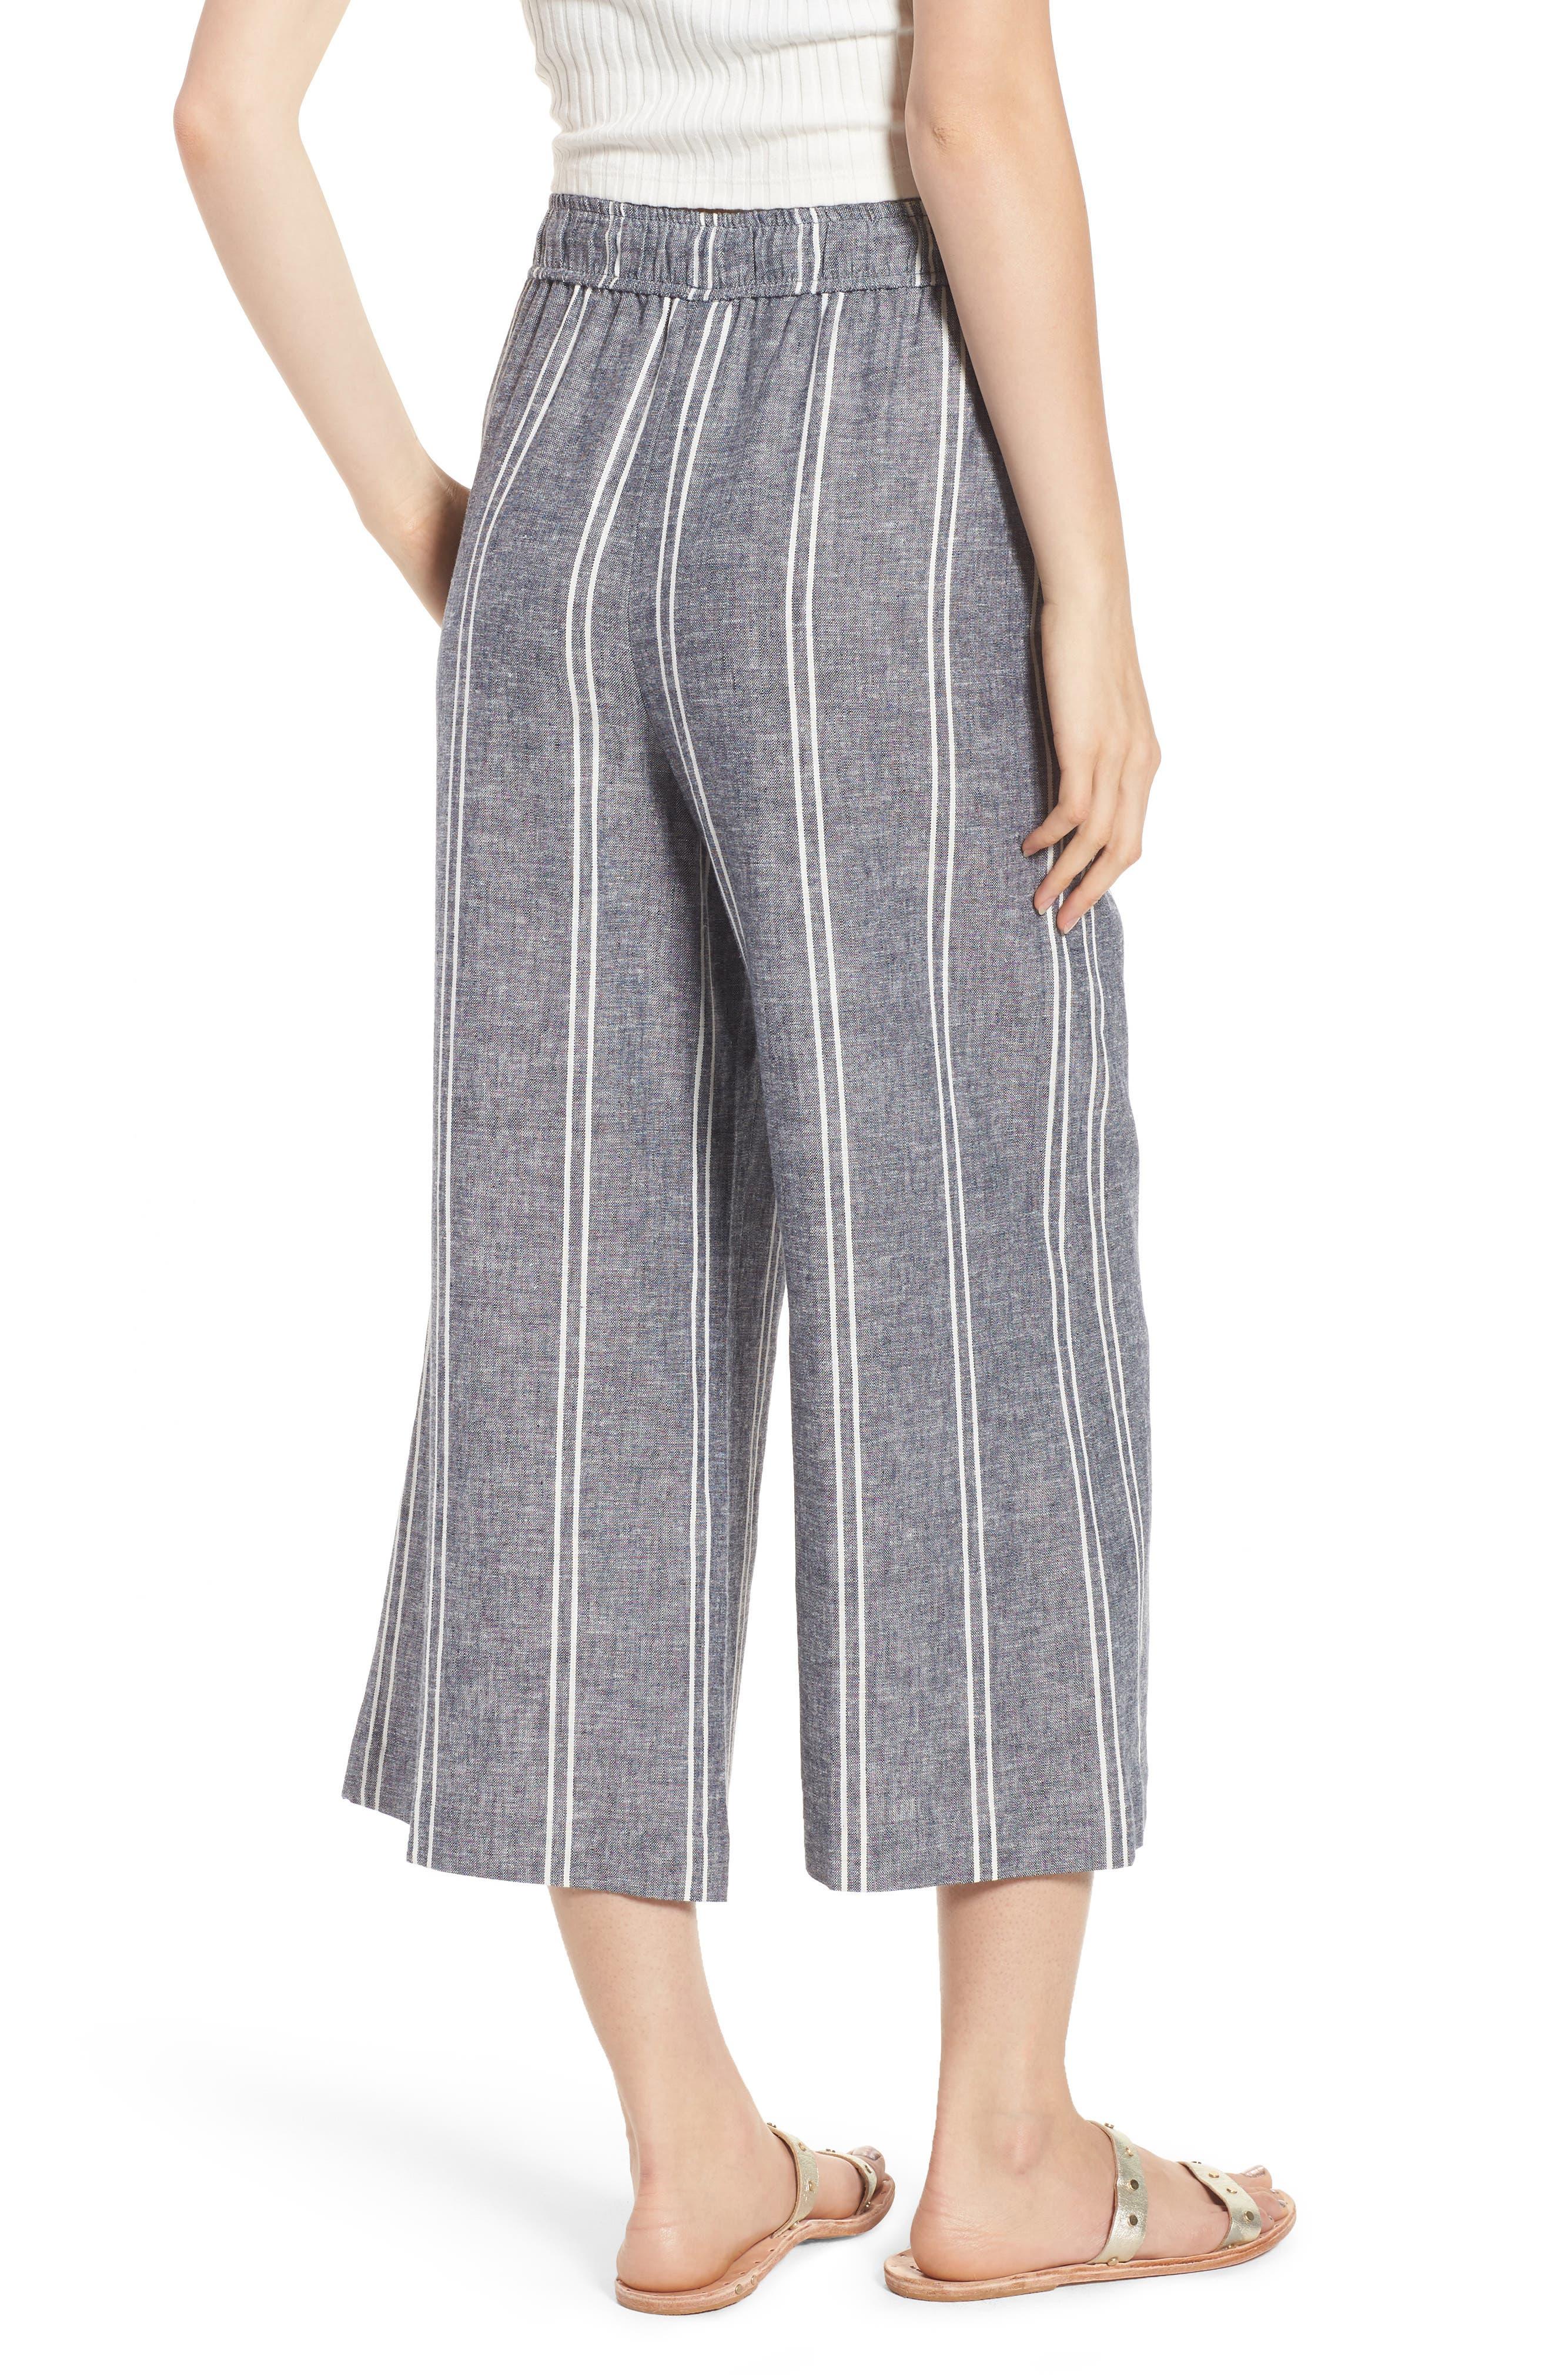 Stripe Linen Blend Culottes,                             Alternate thumbnail 2, color,                             Navy Peacoat Chambray Stripe